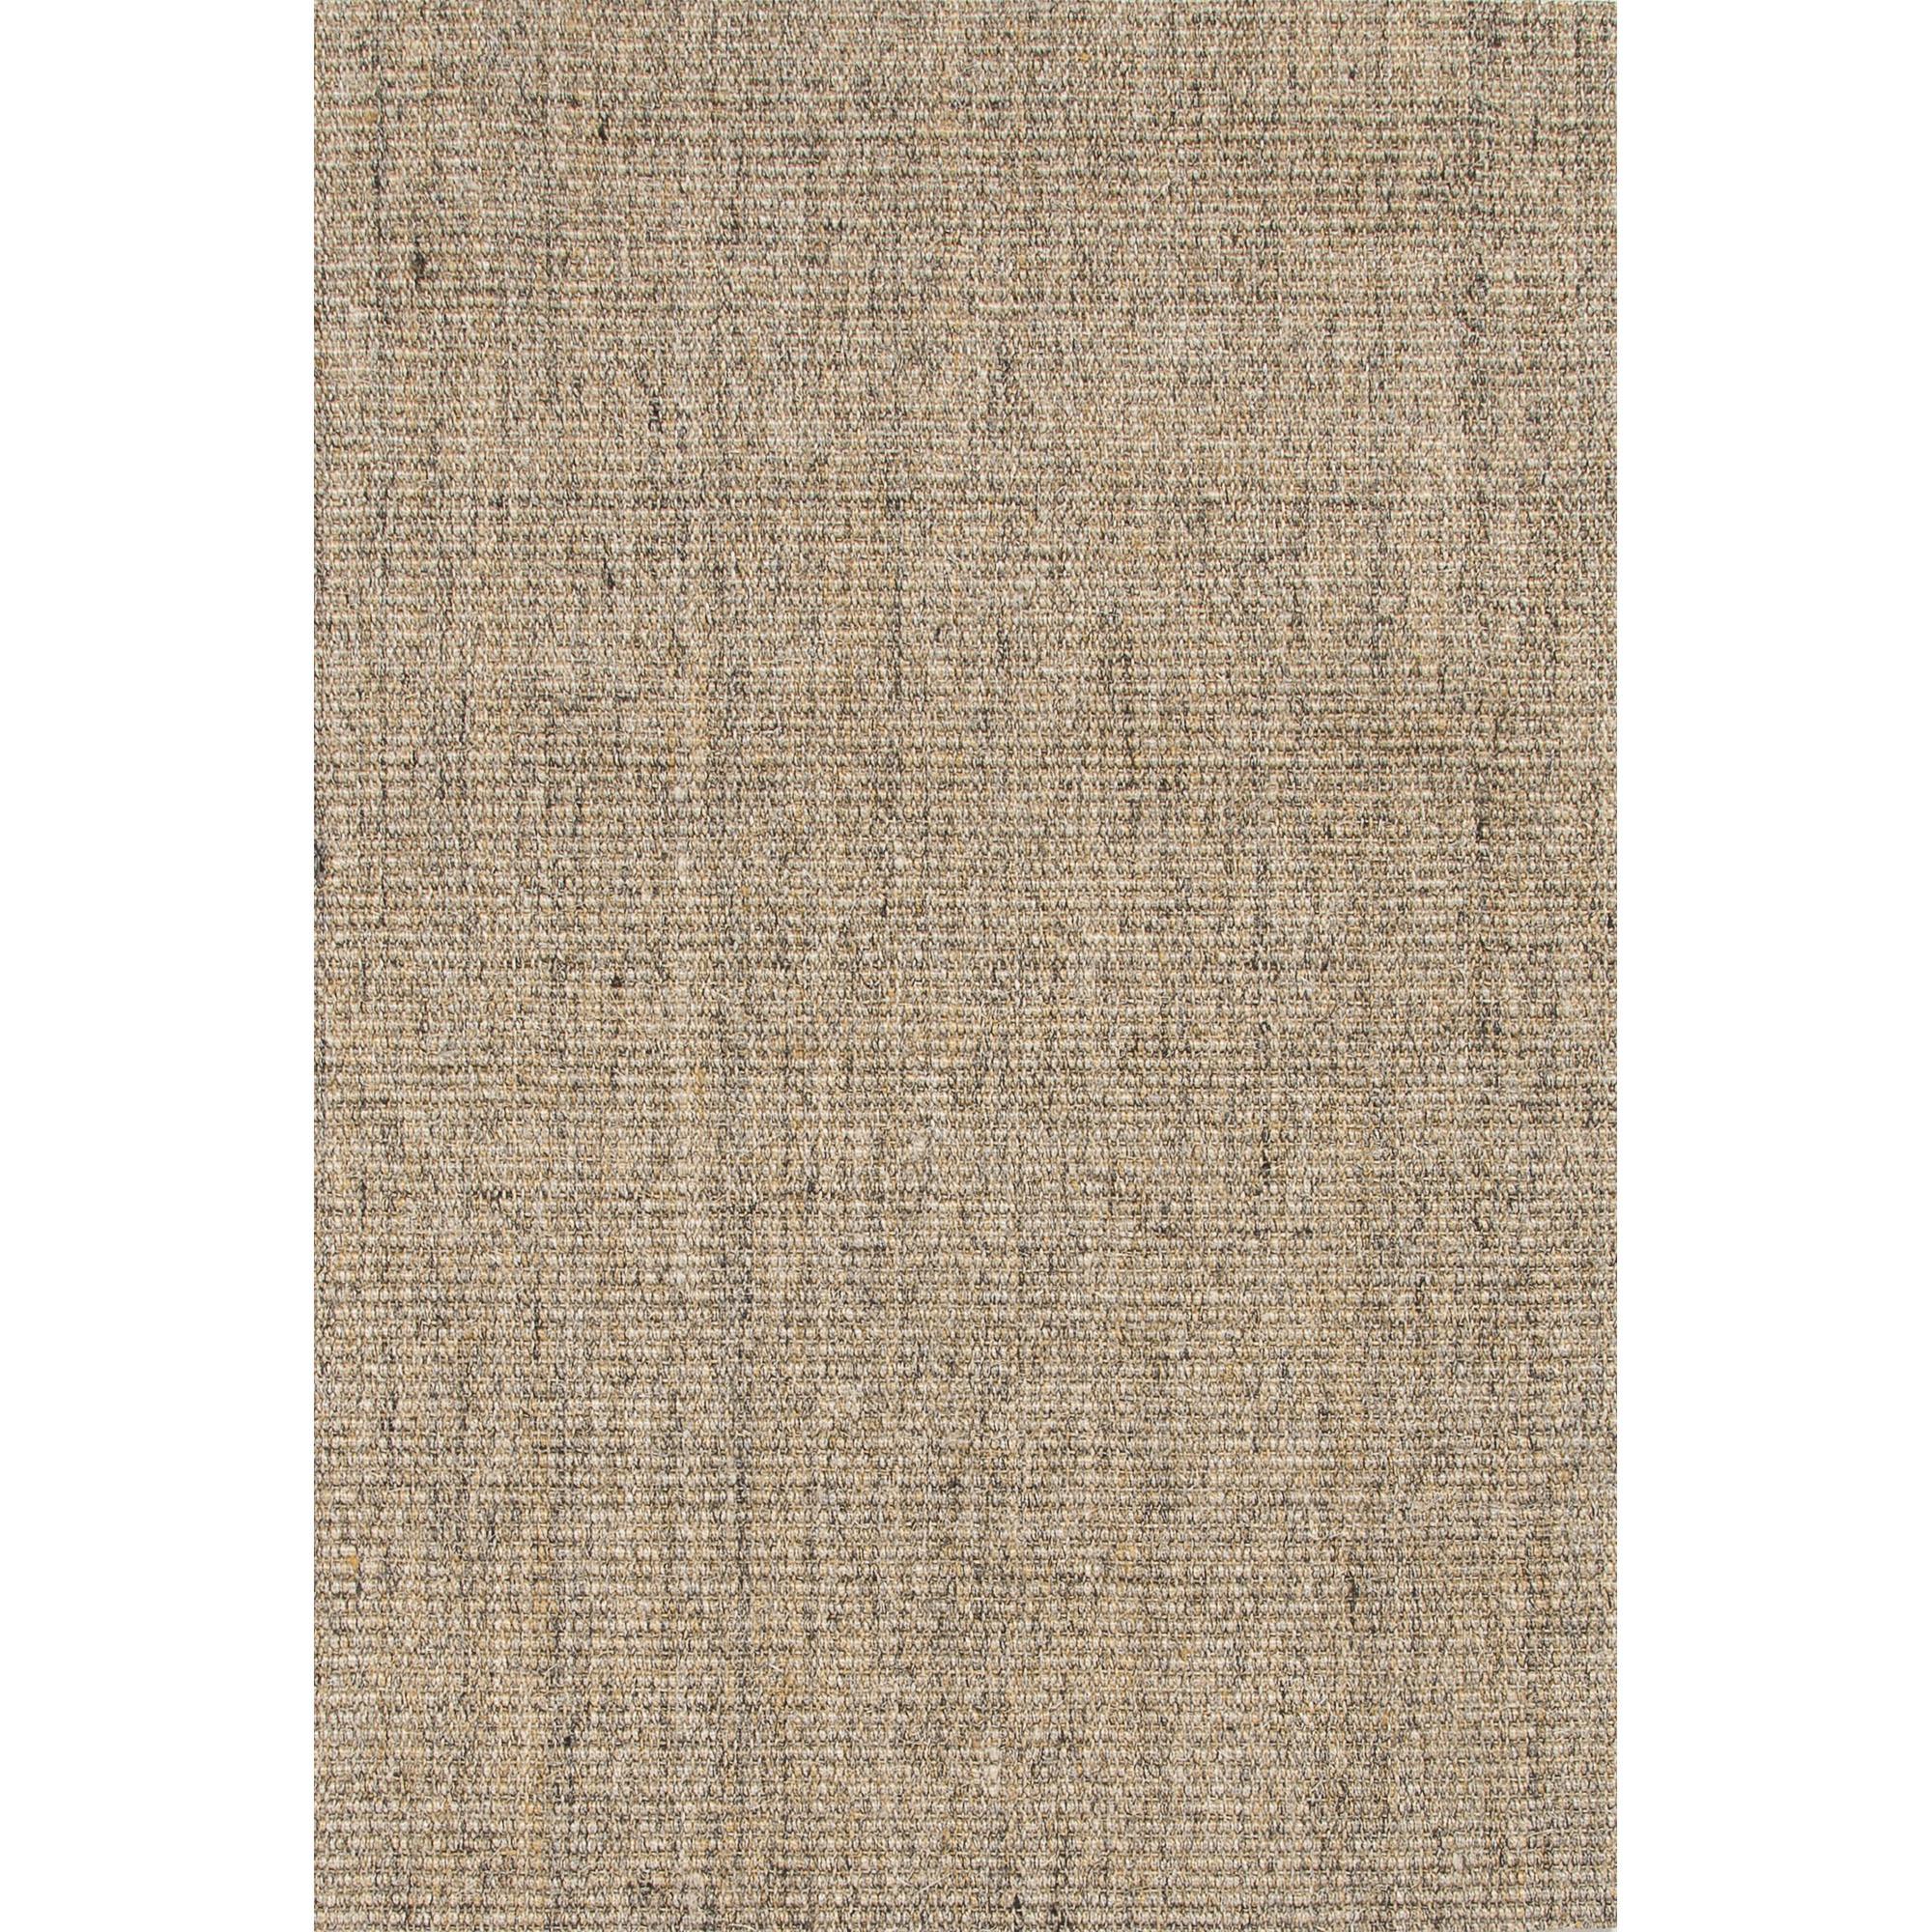 JAIPUR Rugs Naturals Sanibel 8 x 10 Rug - Item Number: RUG119155